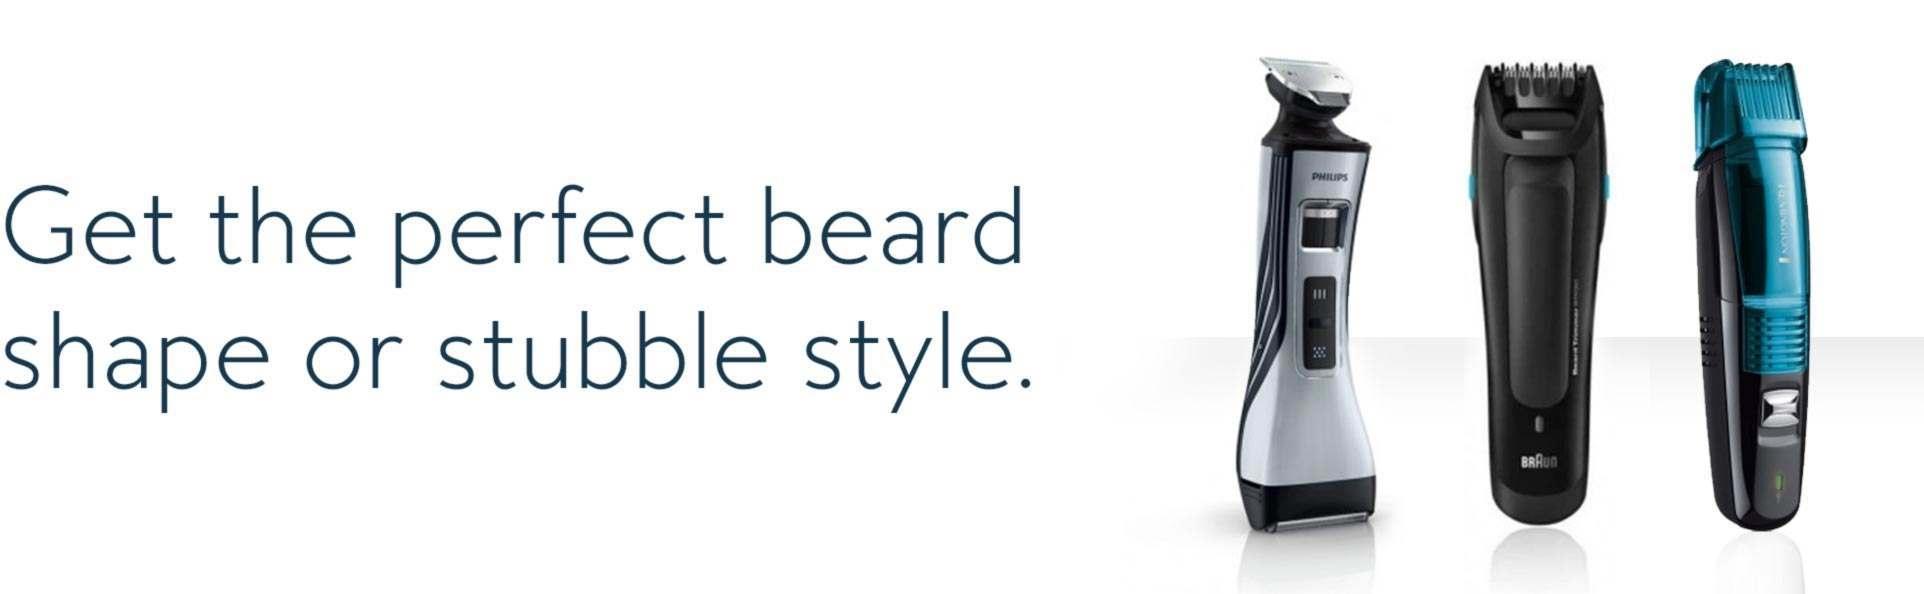 best beard trimmers for men by braun philips remington. Black Bedroom Furniture Sets. Home Design Ideas